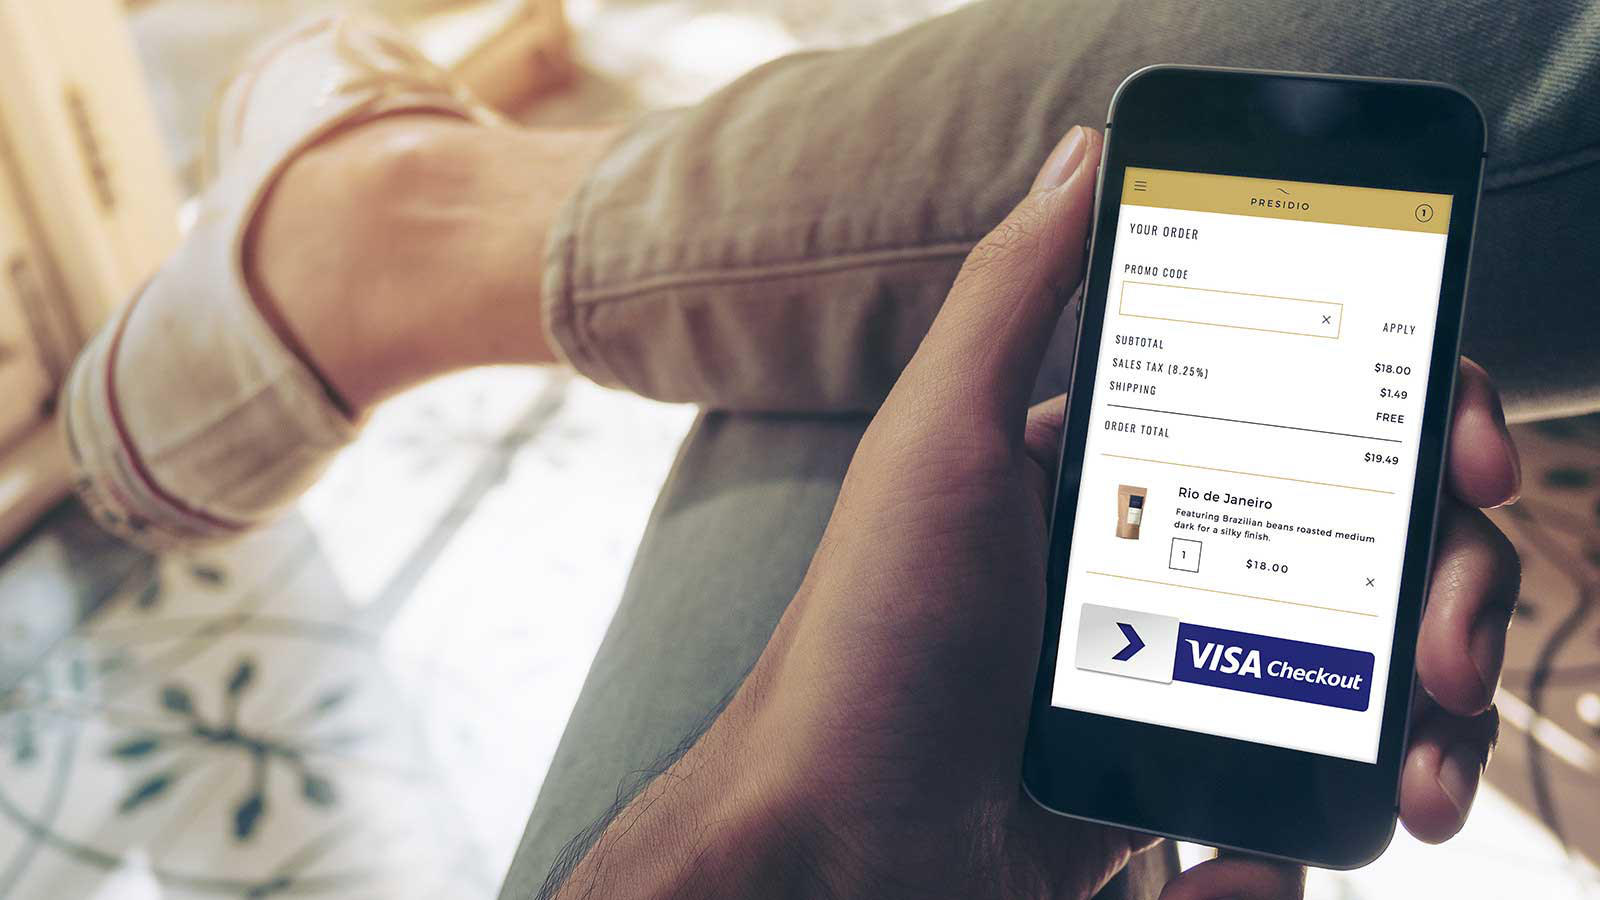 Google Pay Visa Checkout płatności telefonem w internecie